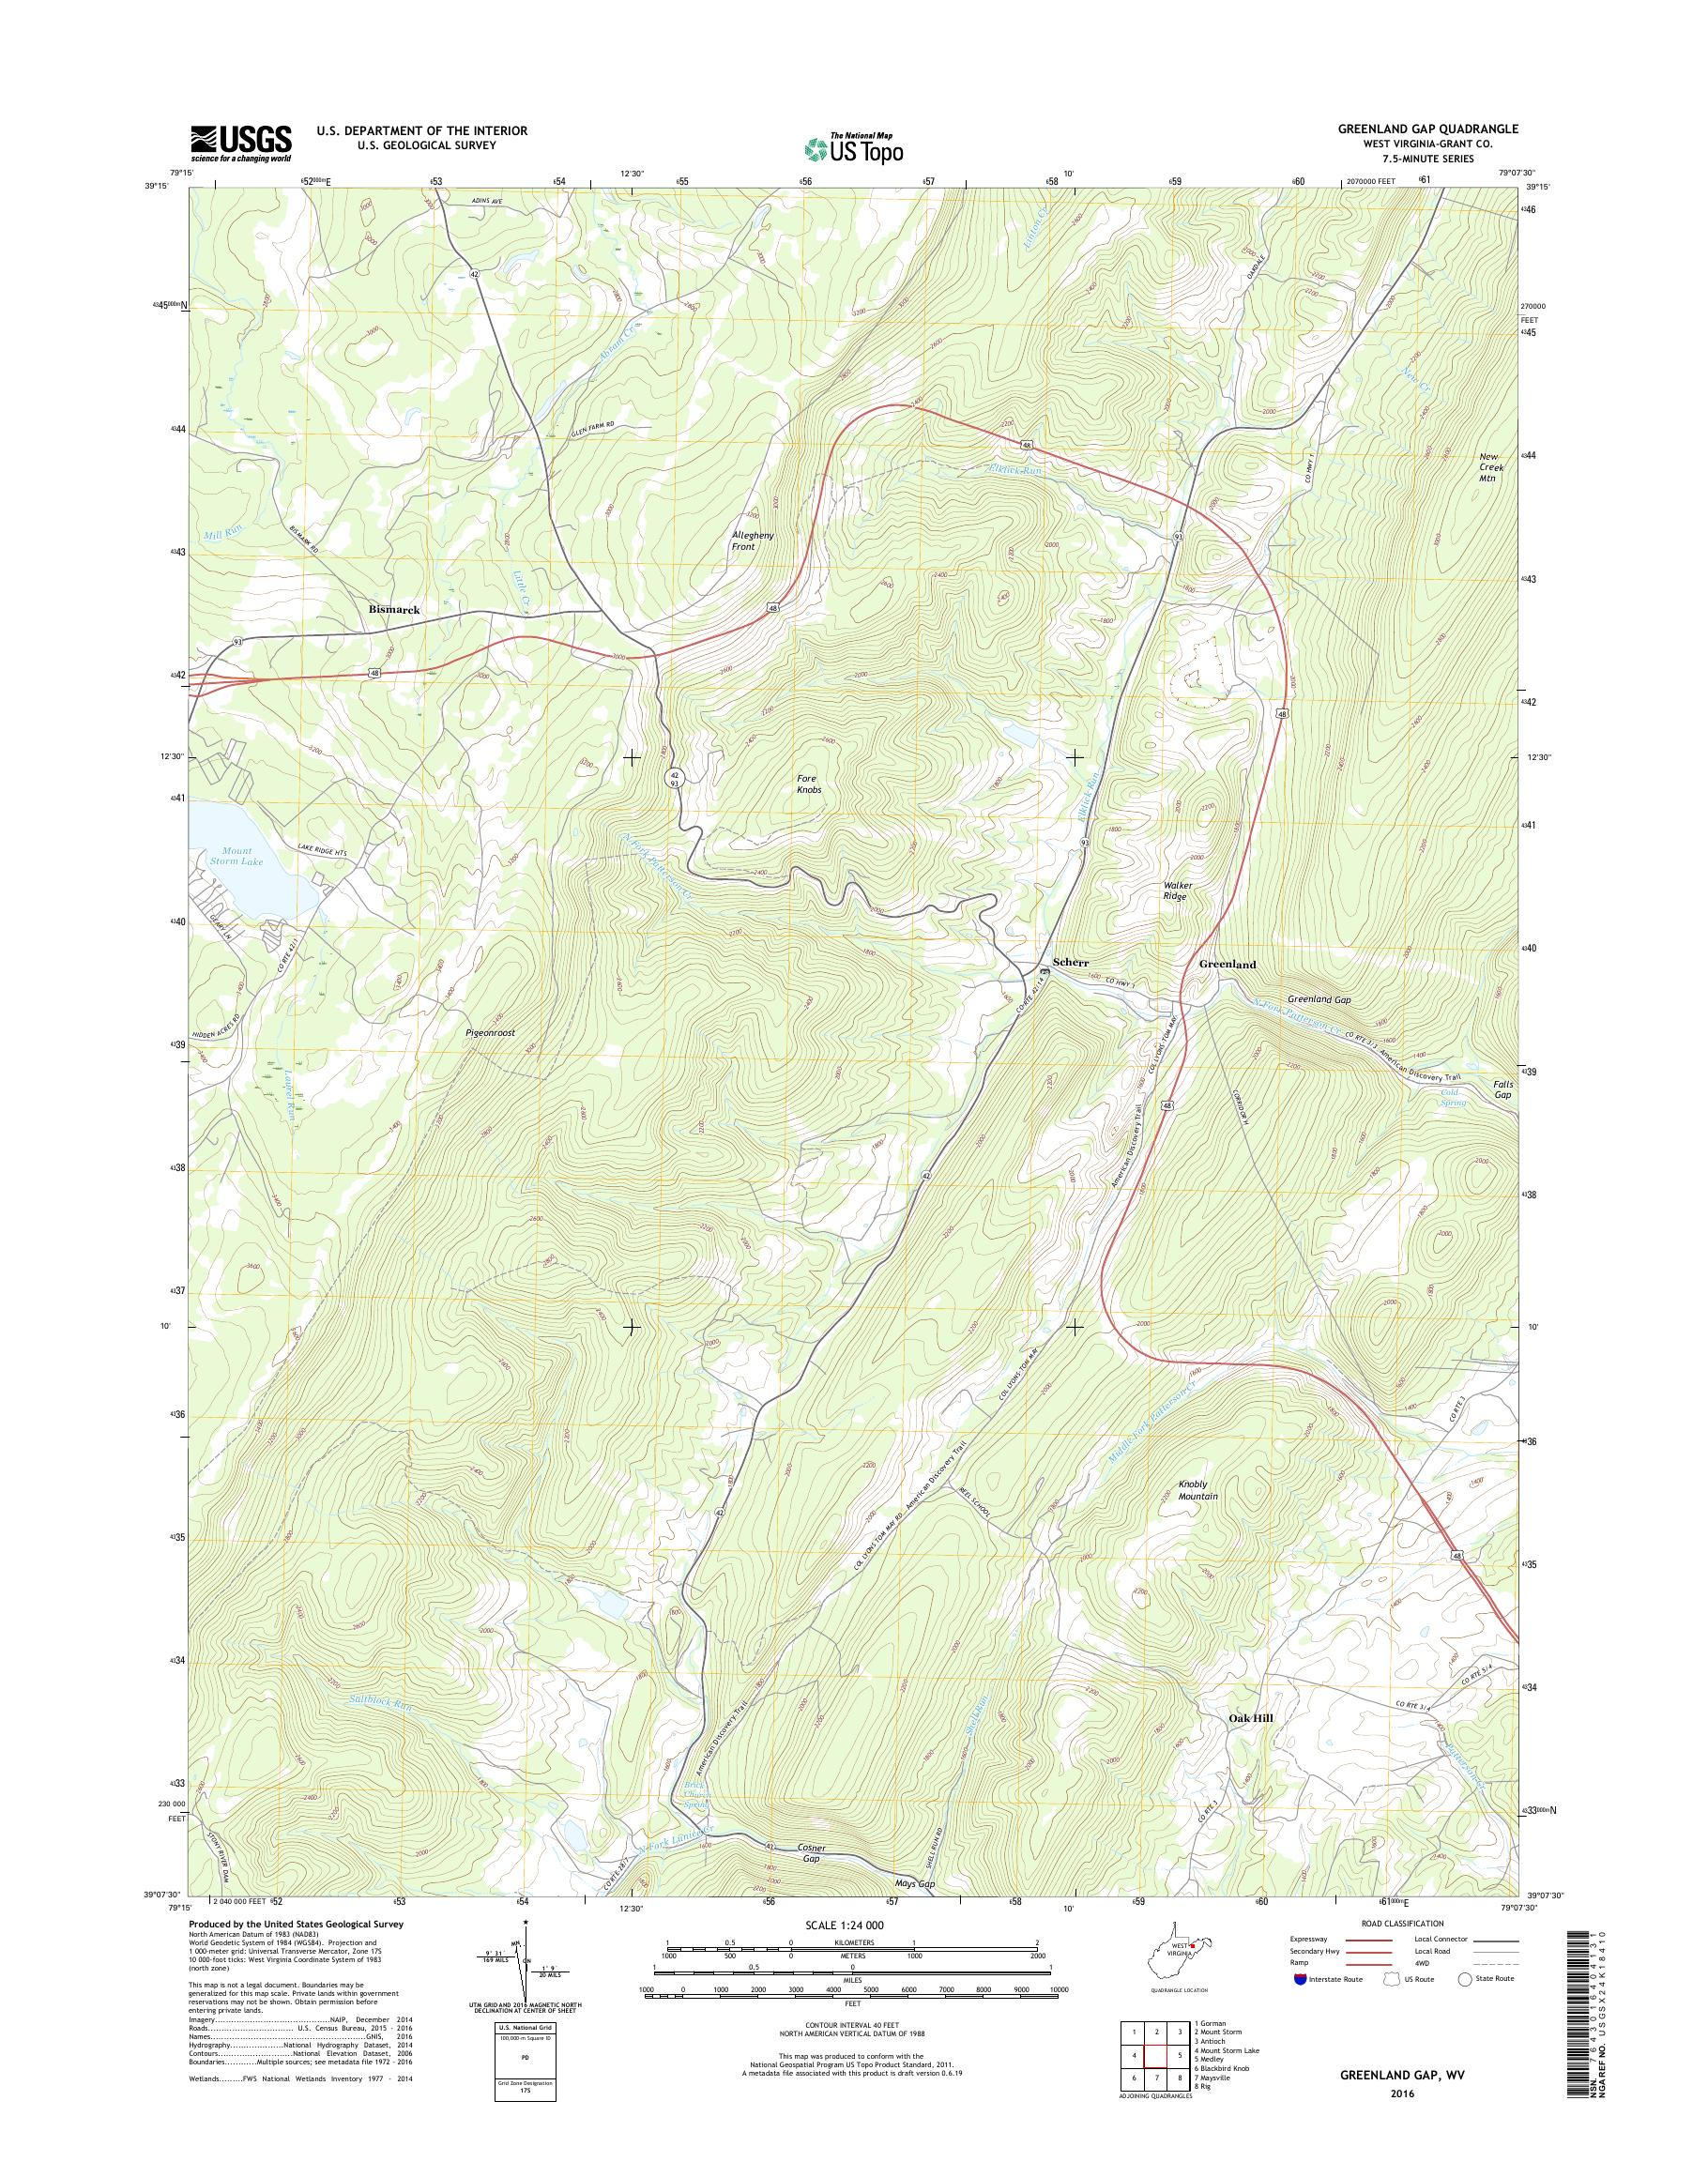 MyTopo Greenland Gap, West Virginia USGS Quad Topo Map